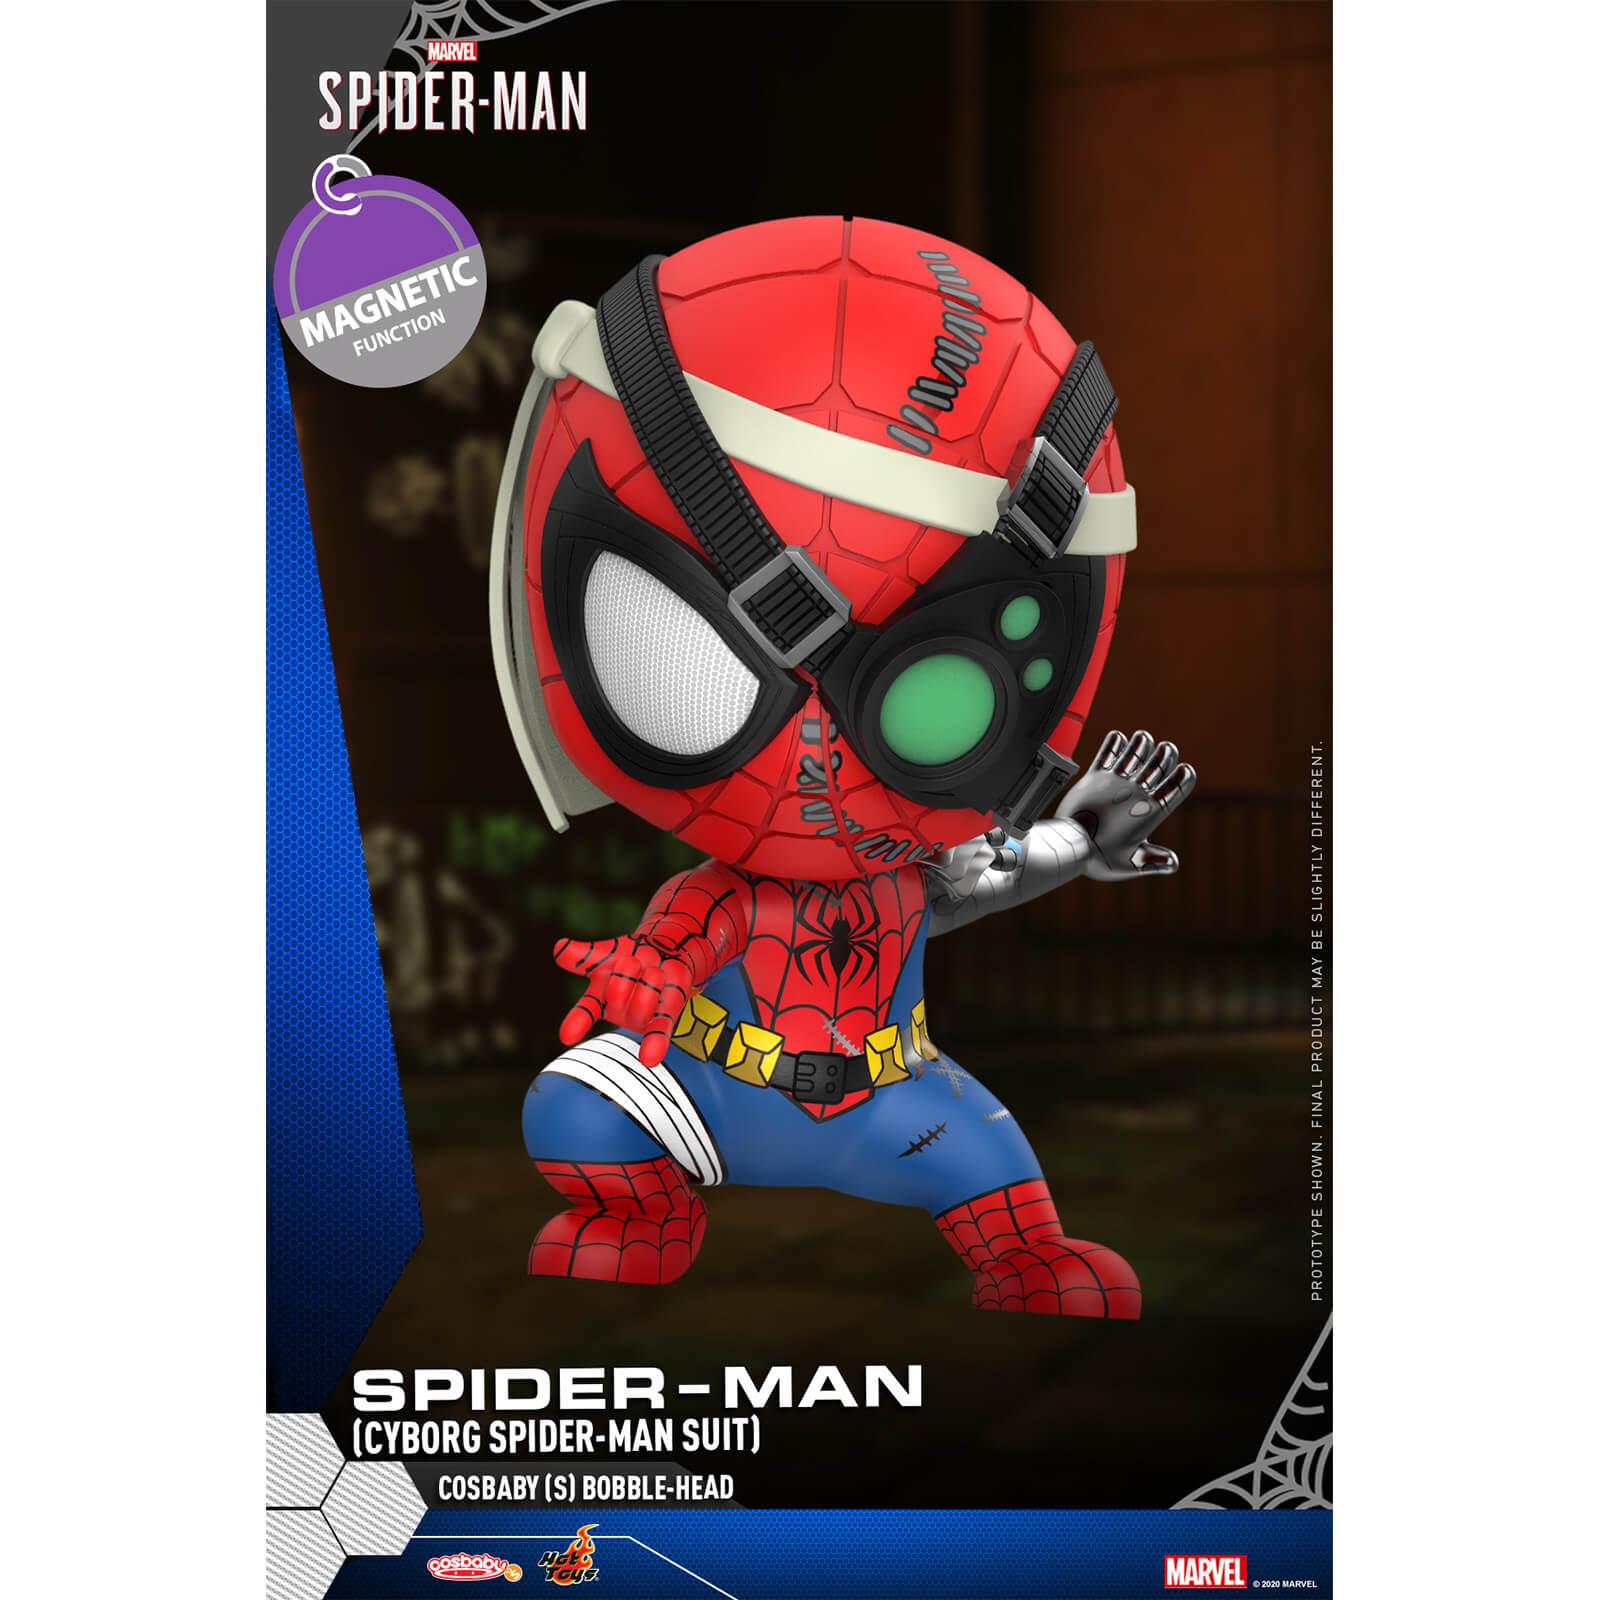 Hot Toys Cosbaby Marvel's Spider-Man [Size S] - Spider-Man (Cyborg Spider-Man Suit Version)